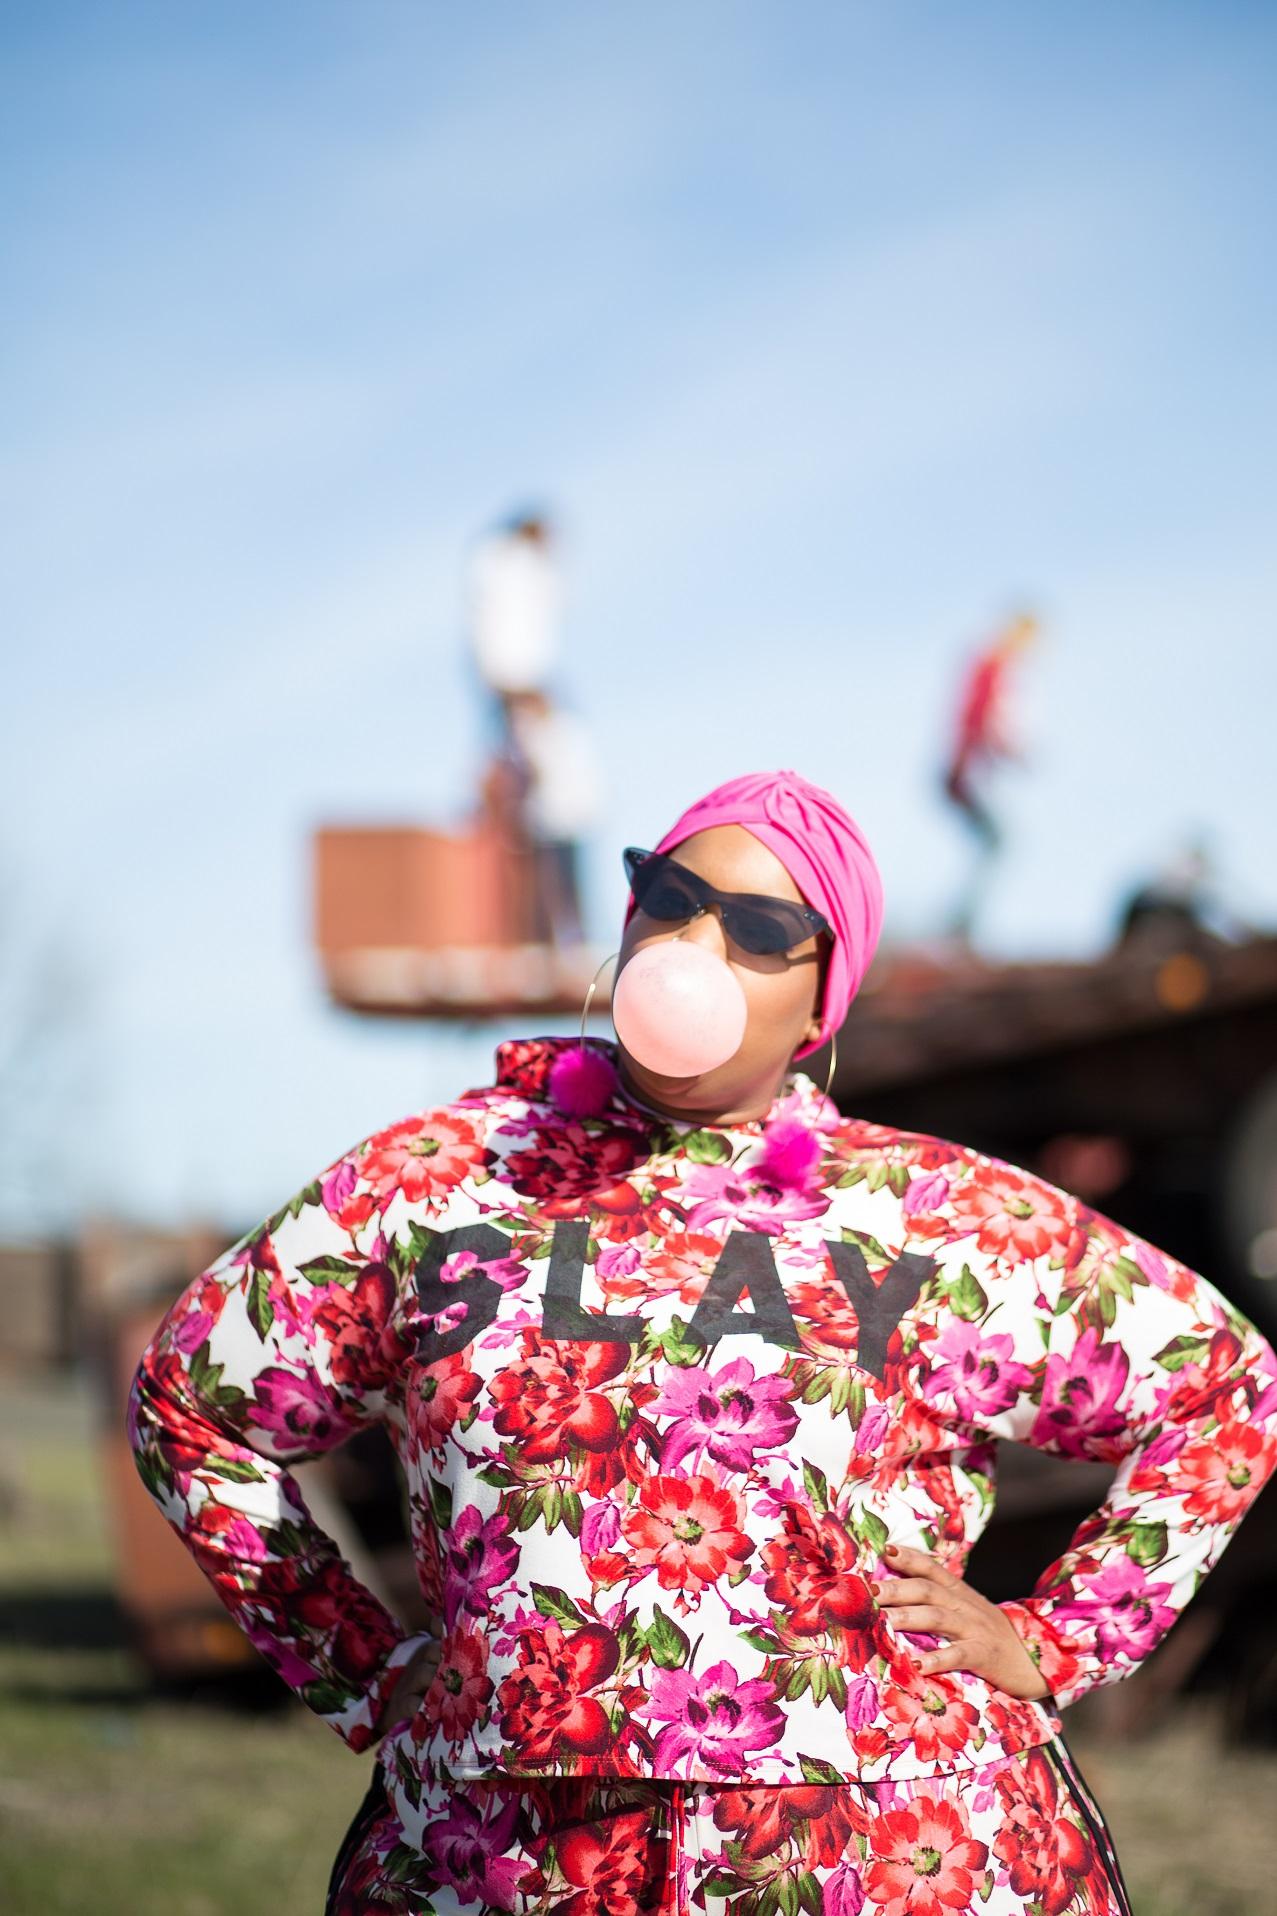 Leah-vernon-Plus-Size-Detroit-Style-blogger-Body-Positive-Muslim-Girl-Model-2